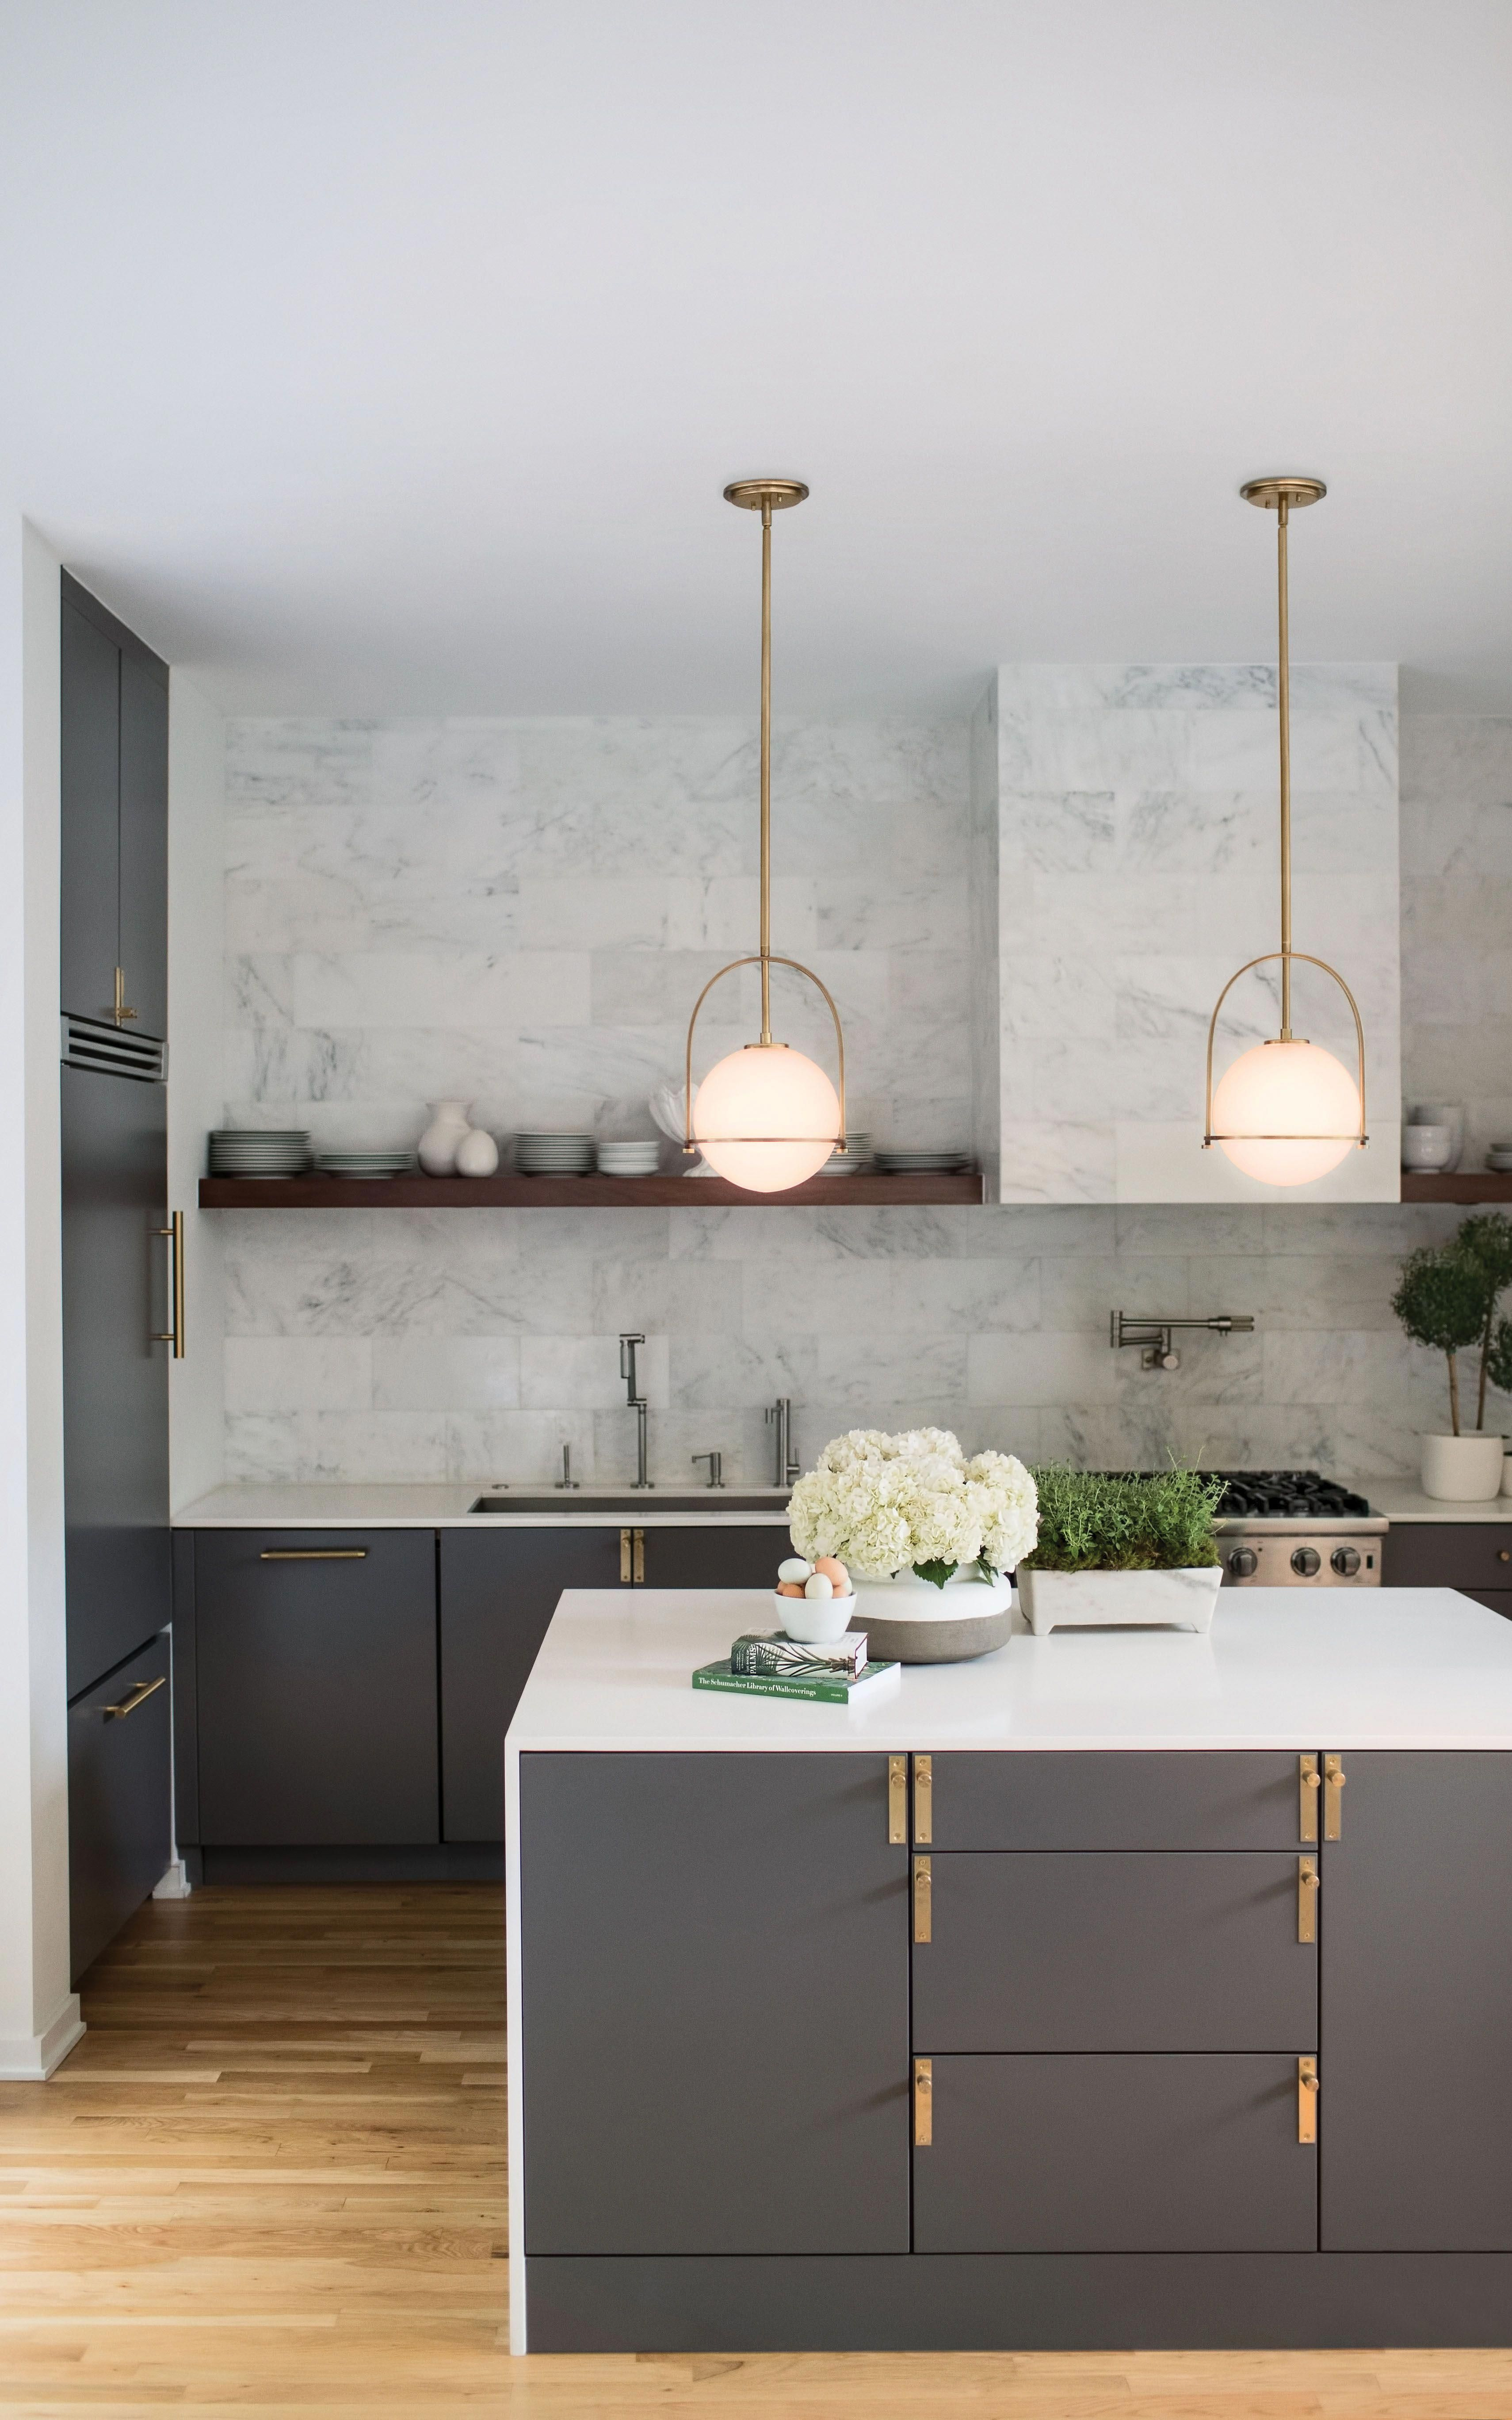 Daily design inspo at Best Interior Designers Blog #interieurdesign #wohndesign #interiordesign #interiordesigntips #interieurdesign #furniture #lavishness #design #trends #piedaterre #architecture #inspiration #kitchenorganization